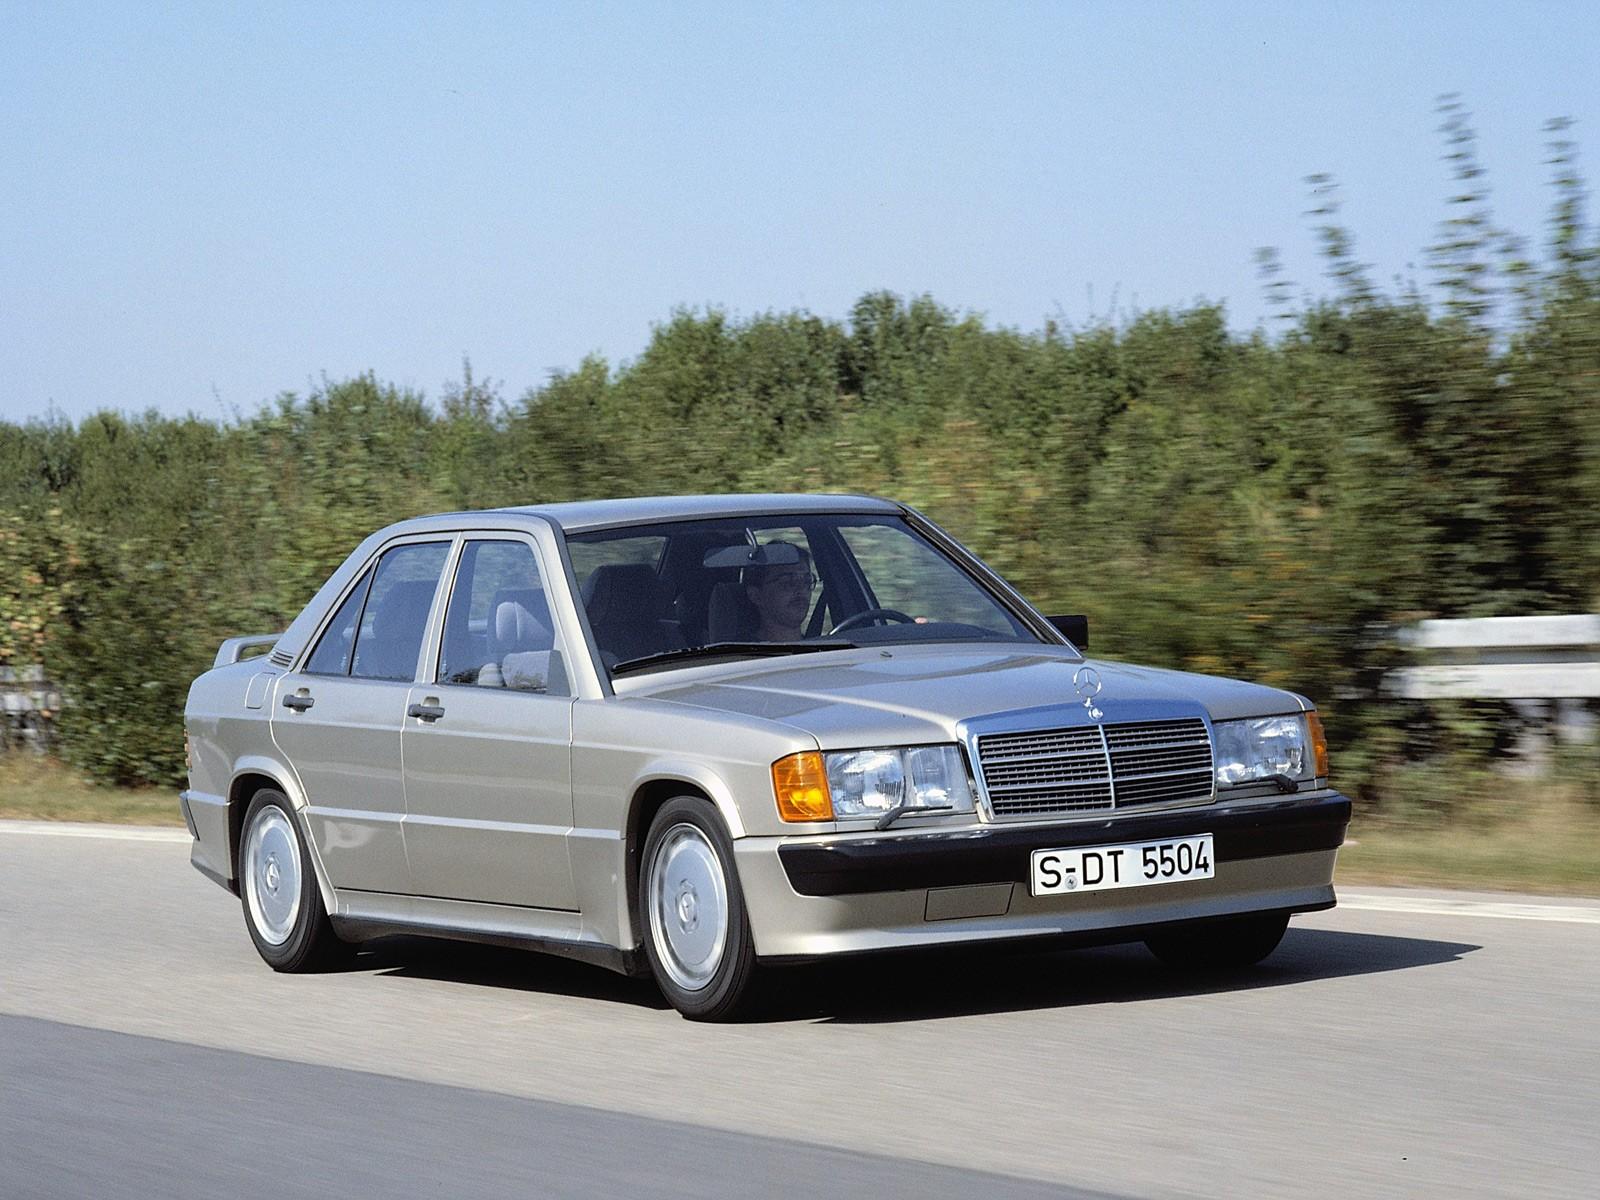 Mercedes Benz 190 E 23 16v Specs Photos 1984 1985 1986 1987 Schematics For 190e 1988